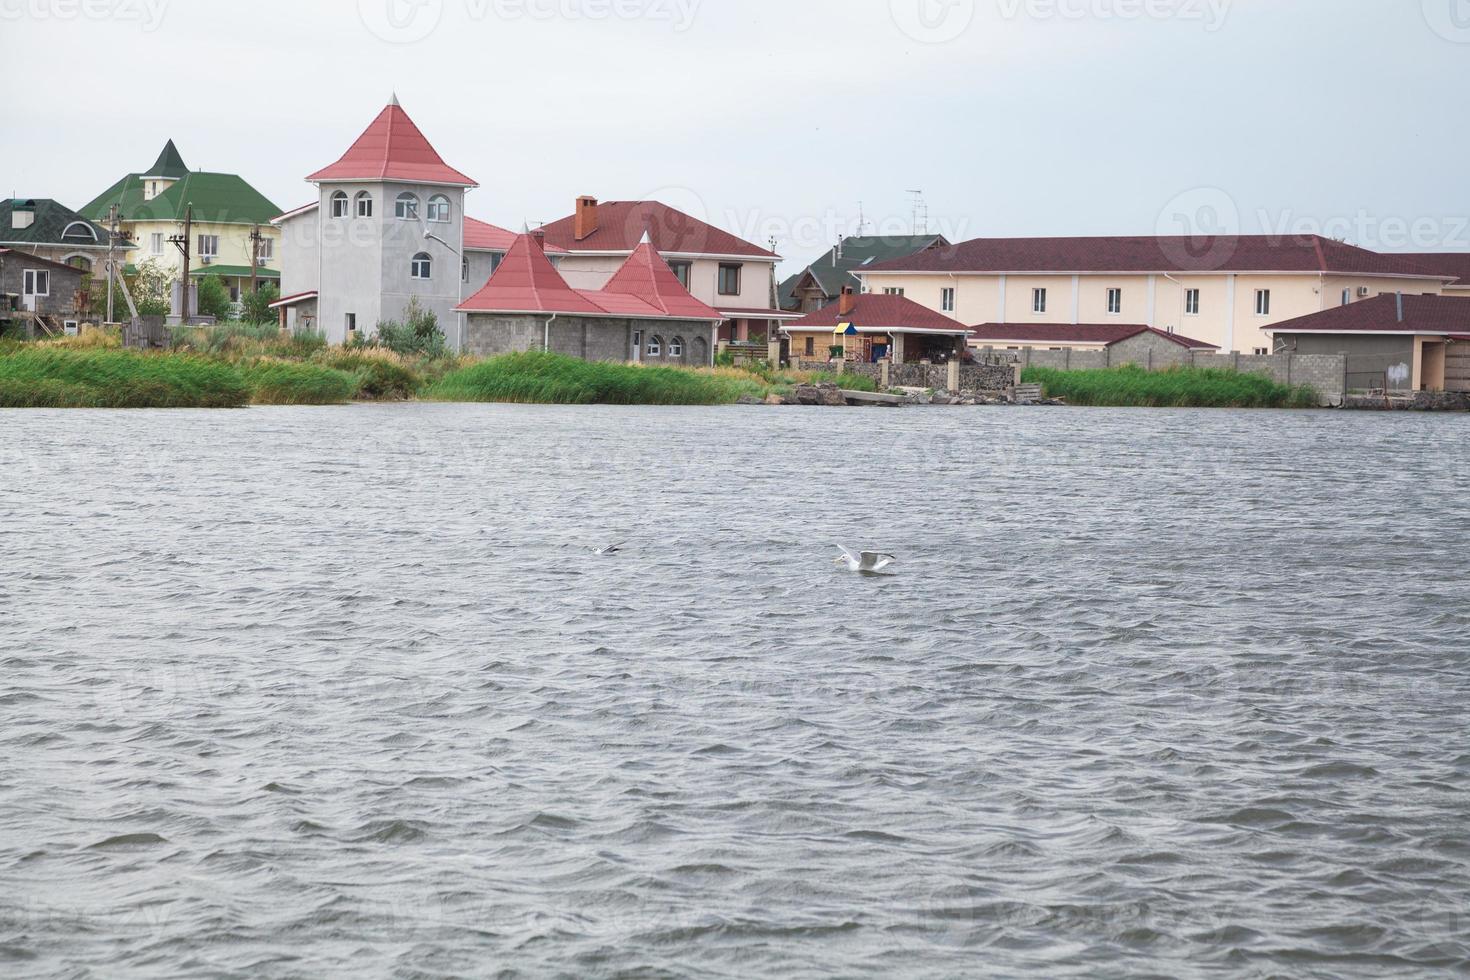 povoado pitoresco na baía foto